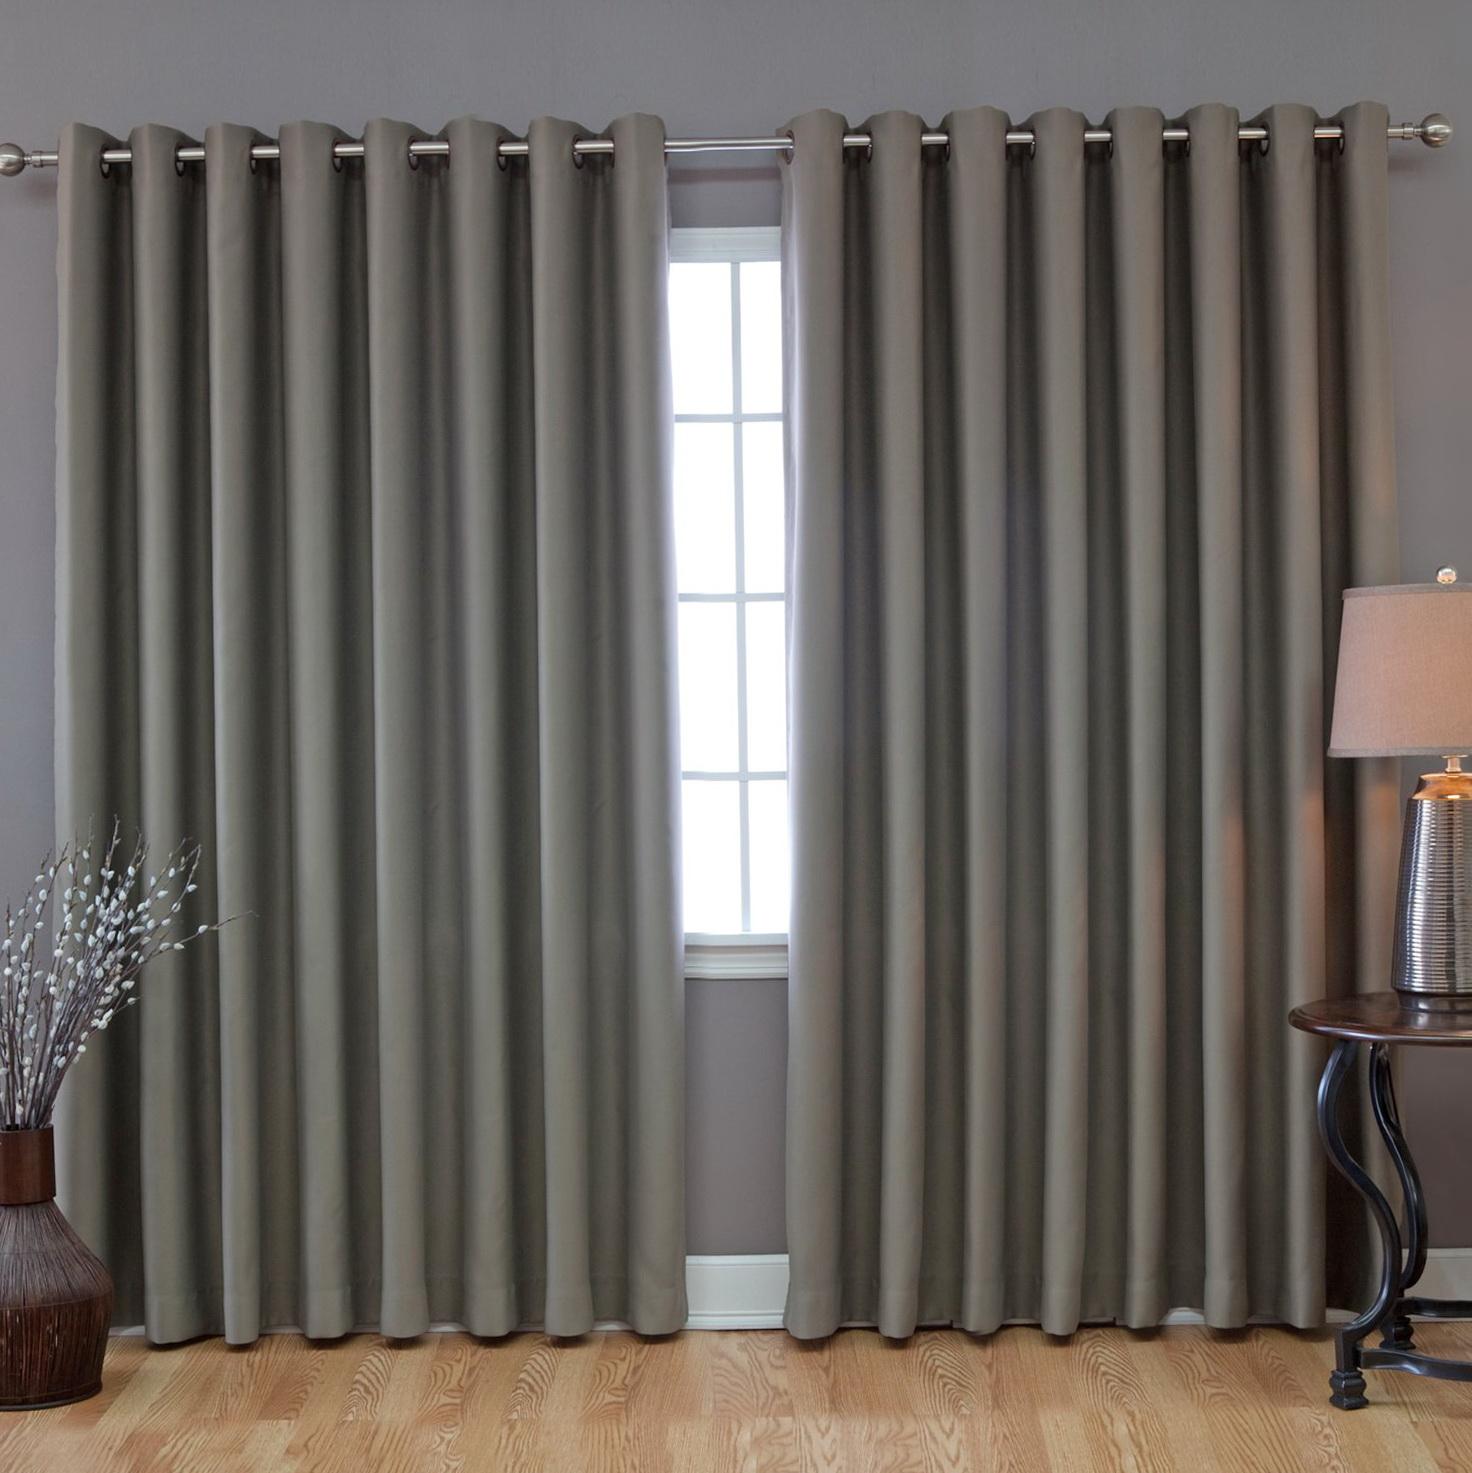 Sliding patio door curtains ideas home design ideas for Door curtain ideas